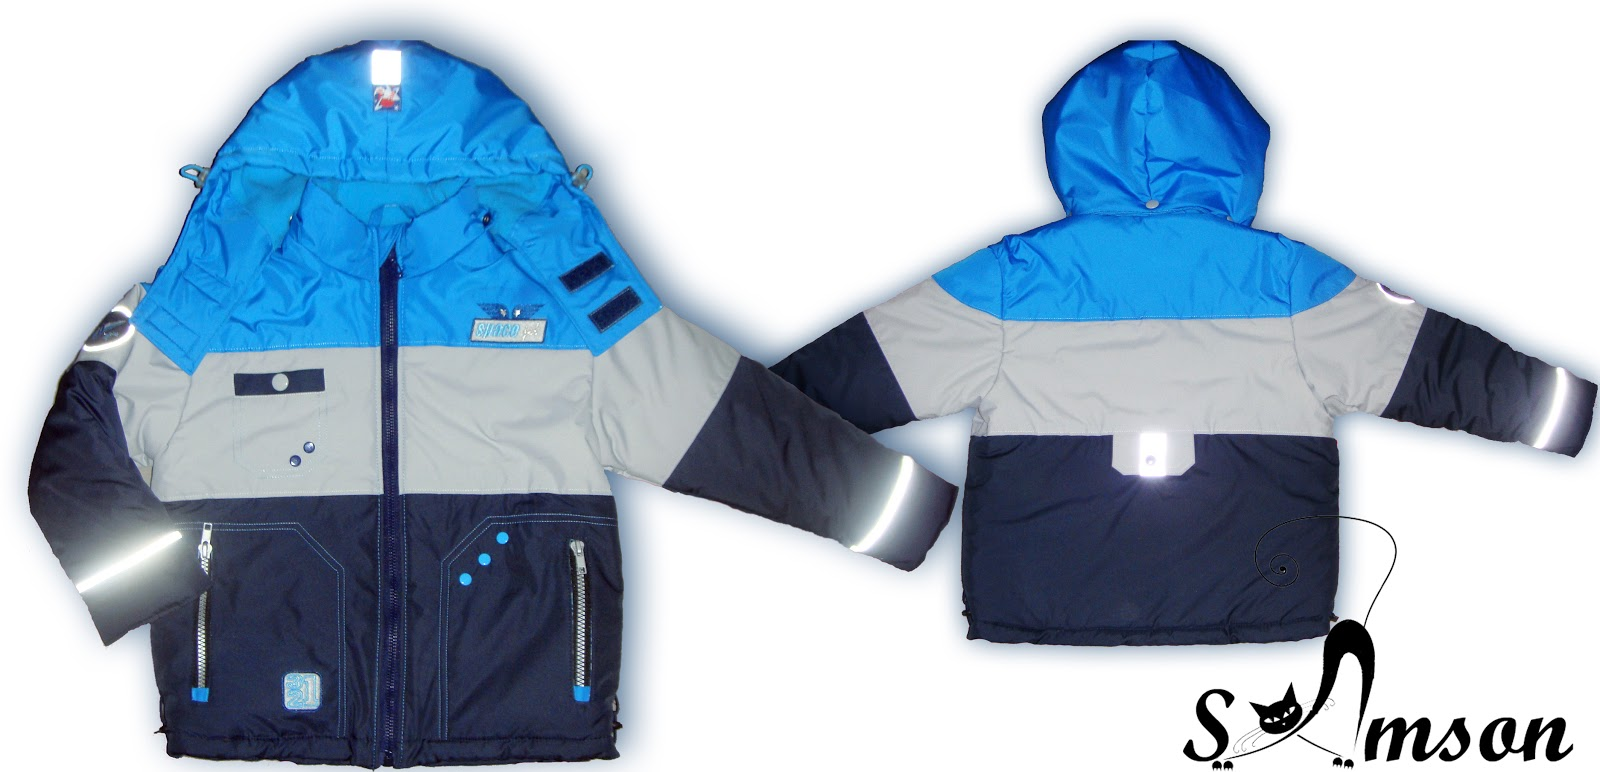 Пошив зимних курток своими руками